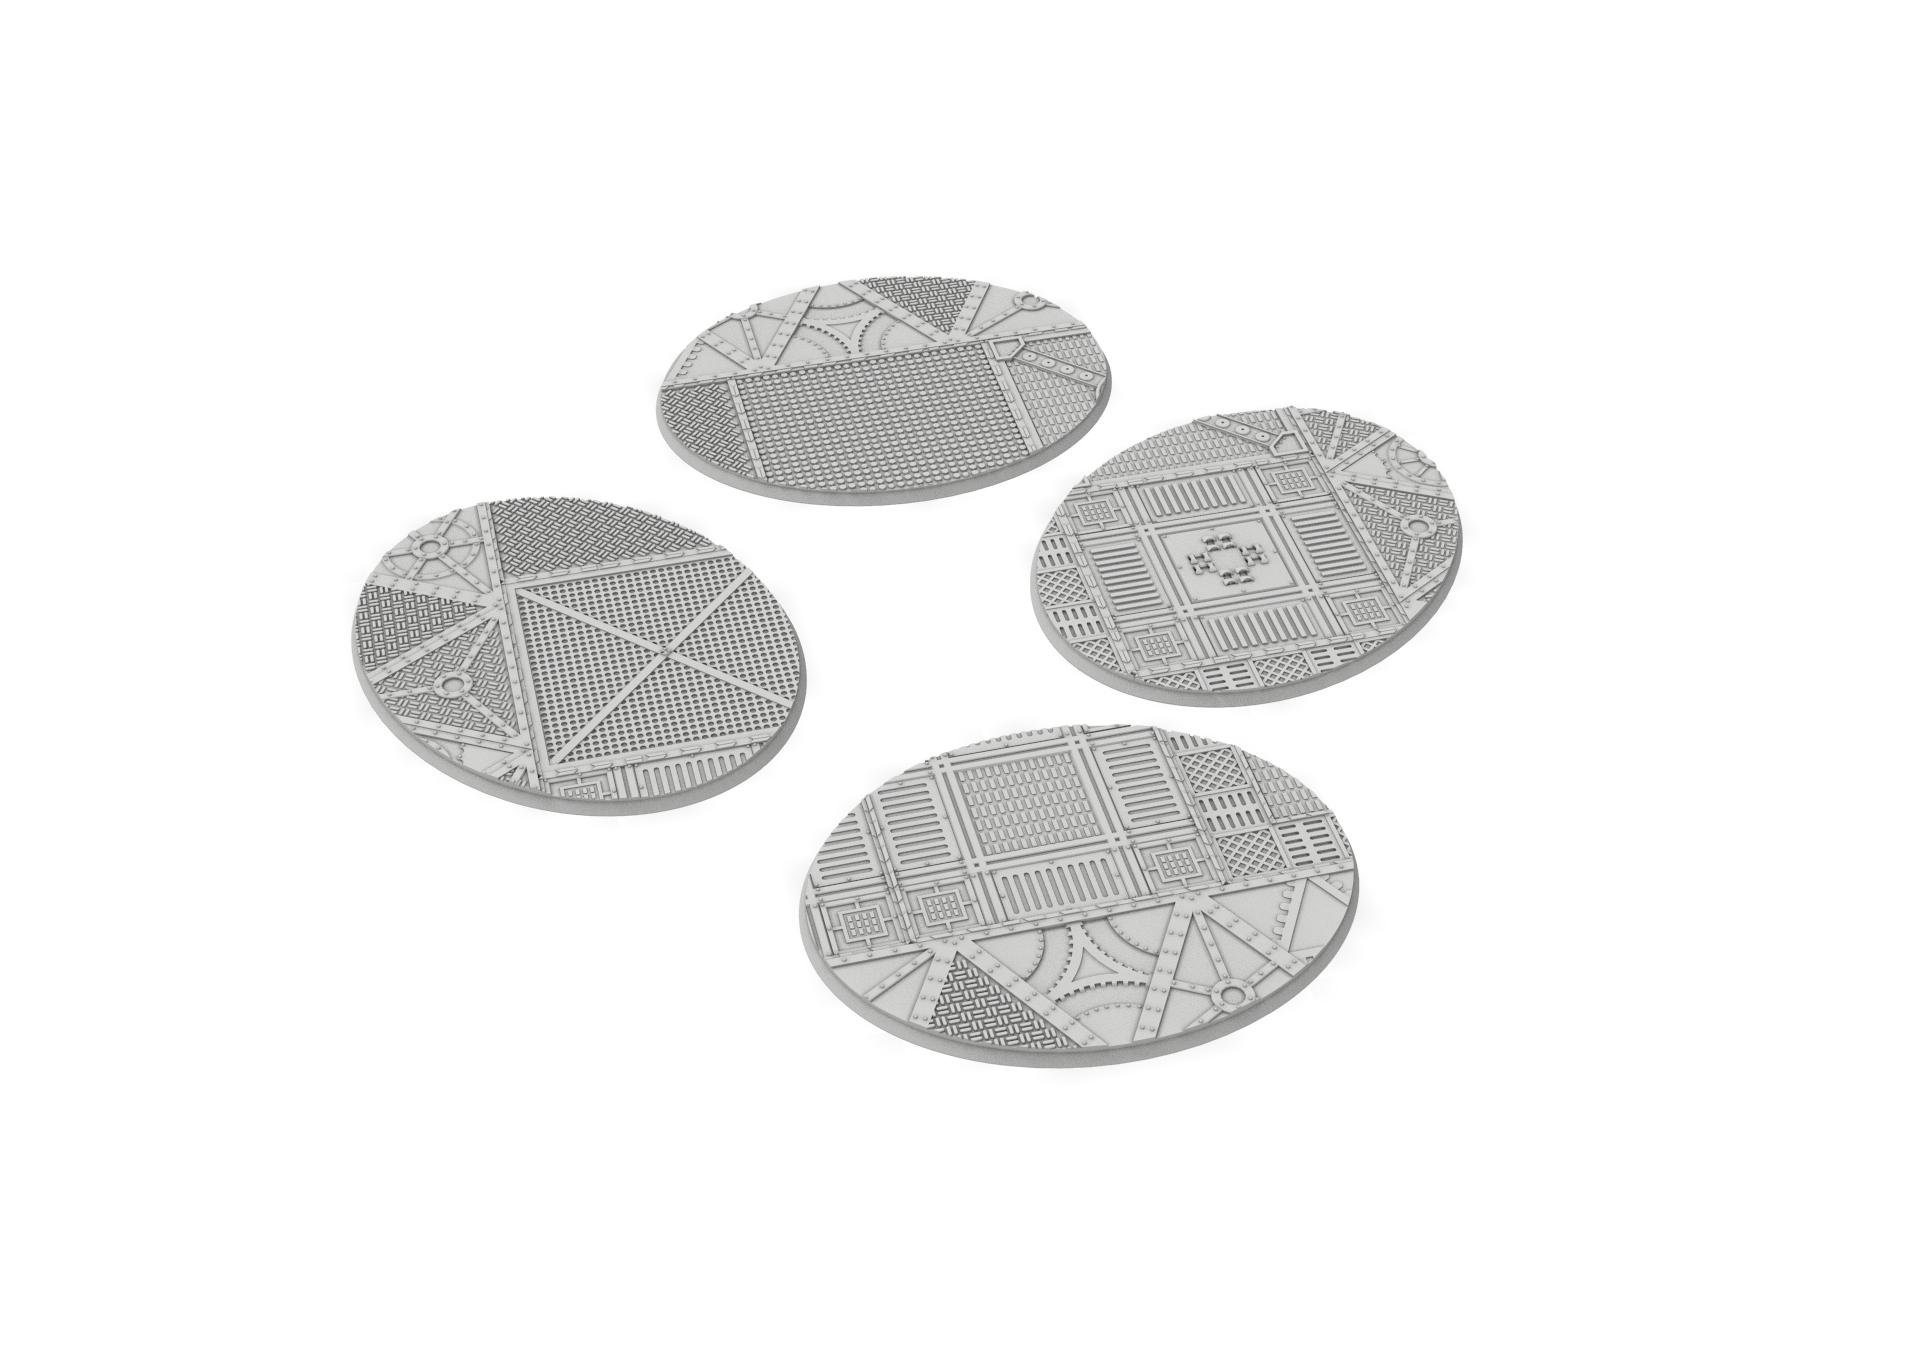 120x95.jpg Download STL file x1000 Round, oval, square, rectangular, hexagonal, industrial textured bases • 3D print design, Alario